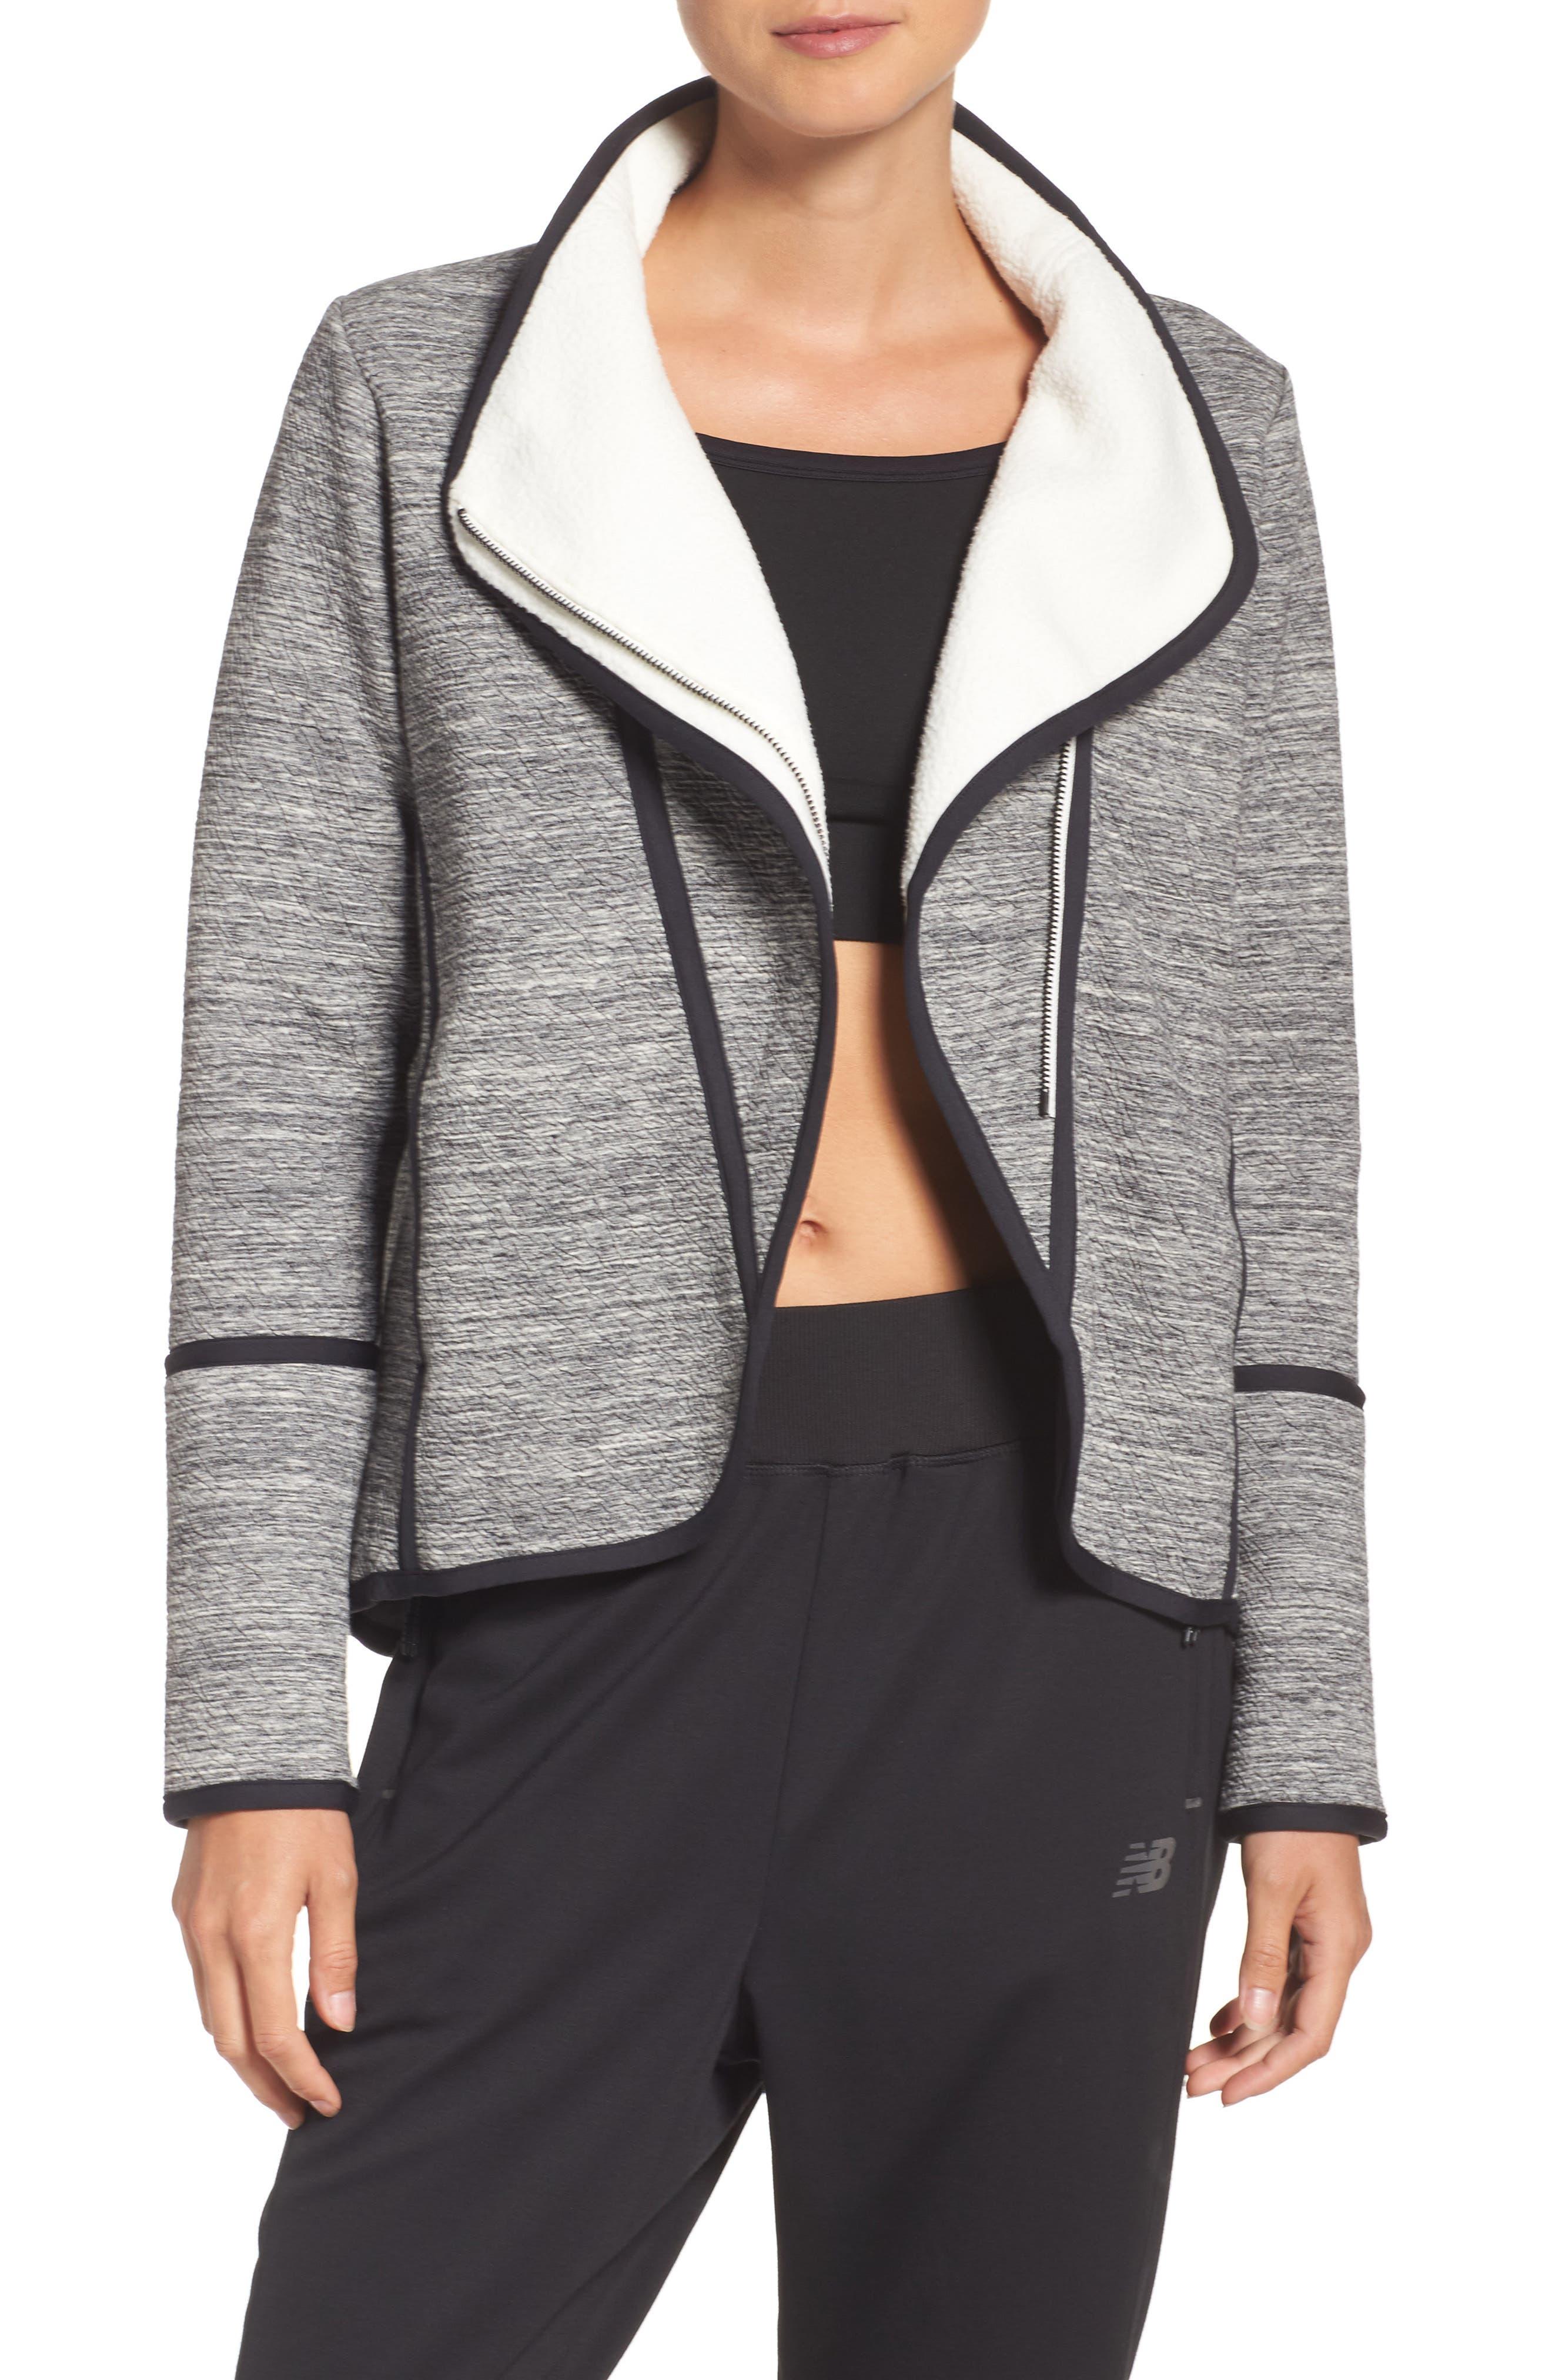 new balance intensity jacket. new balance studio en route jacket intensity